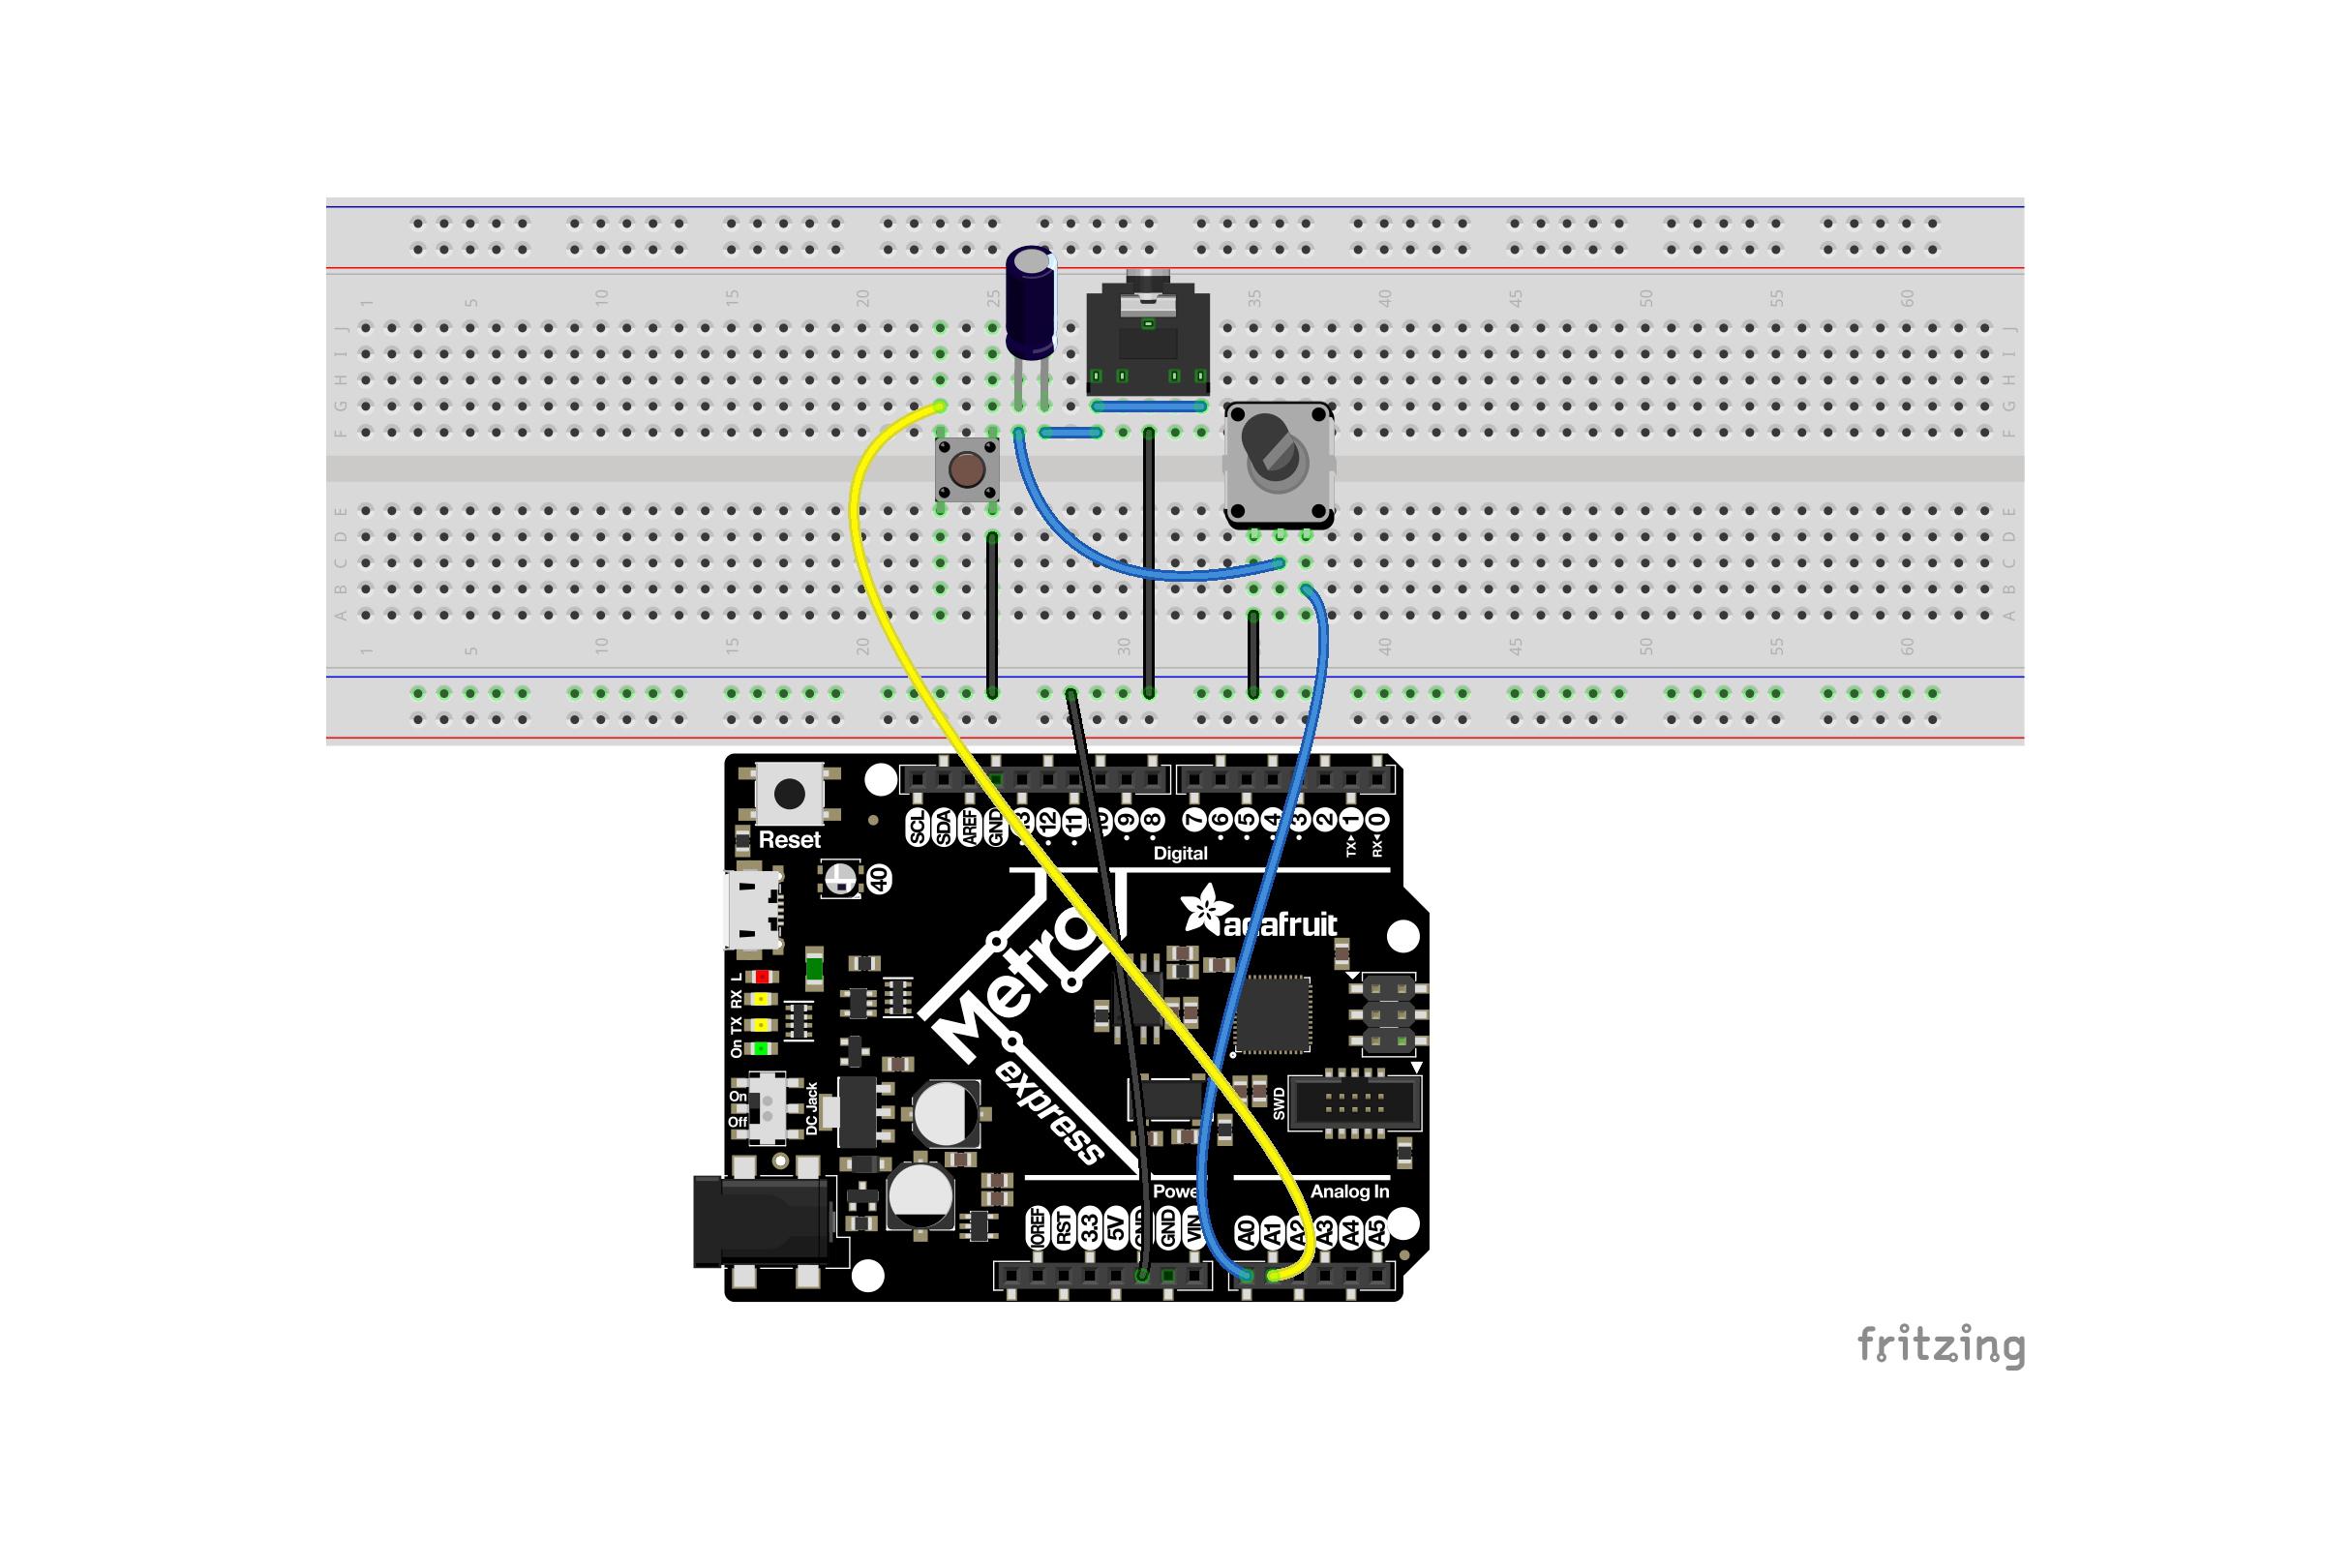 circuitpython_MetroM0AudioJackButtonPot_bb.jpg